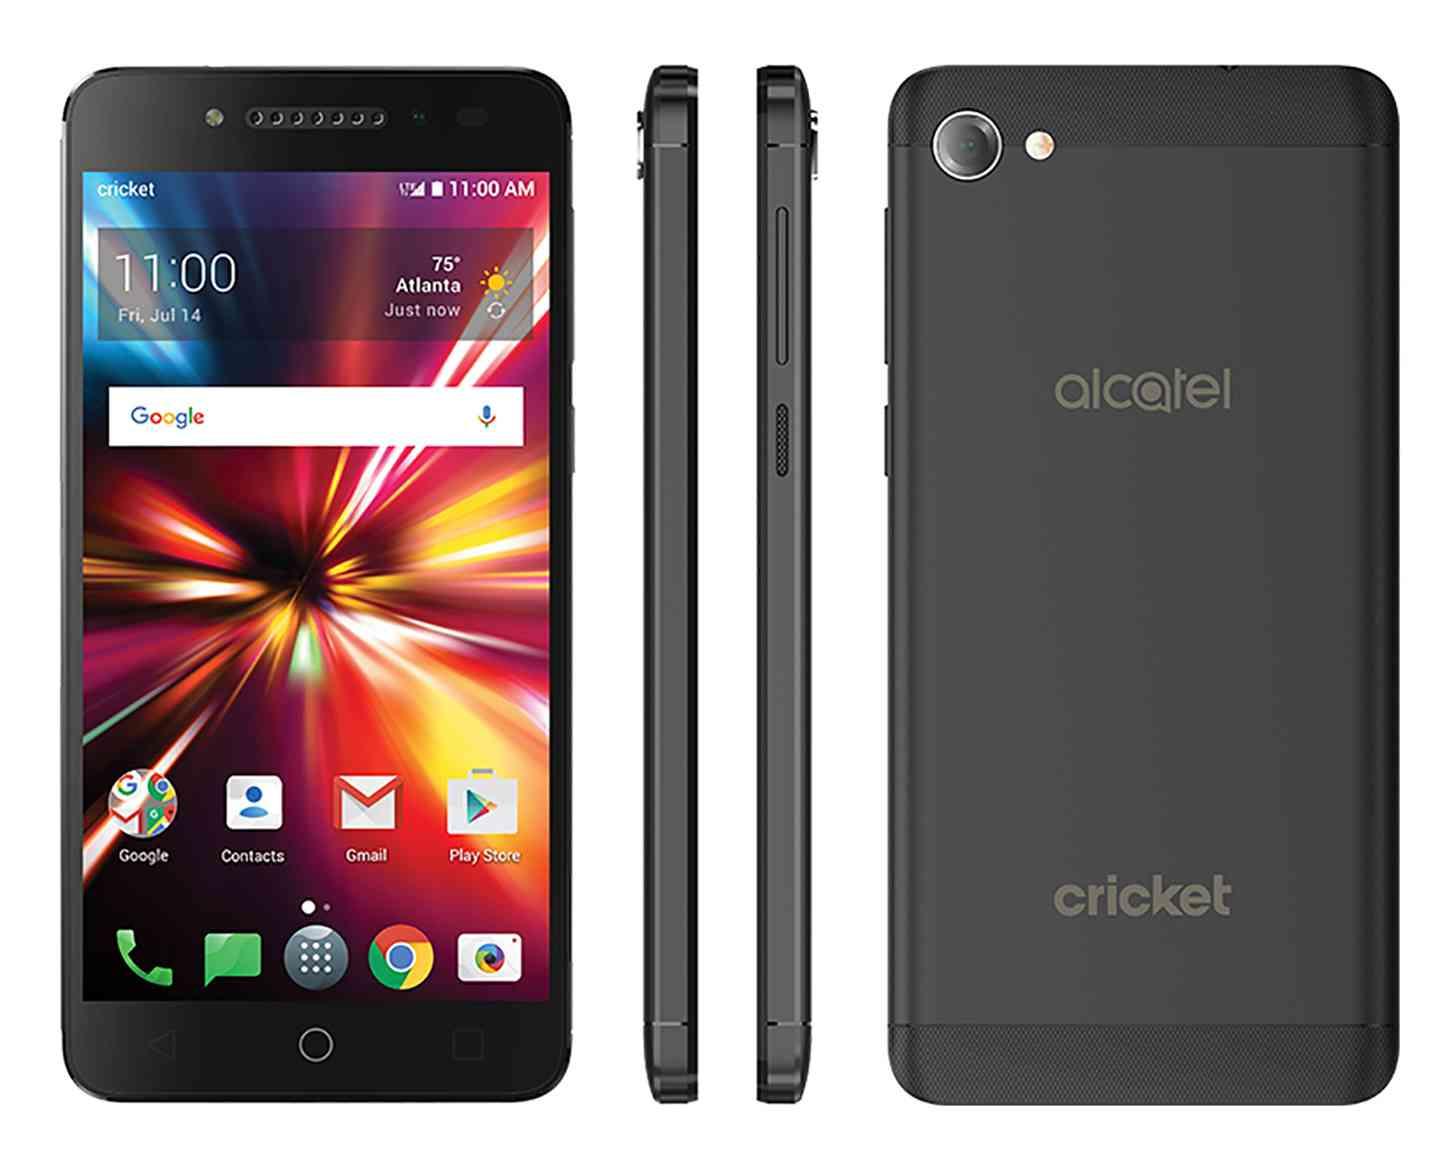 Alcatel Pulsemix Cricket Wireless official